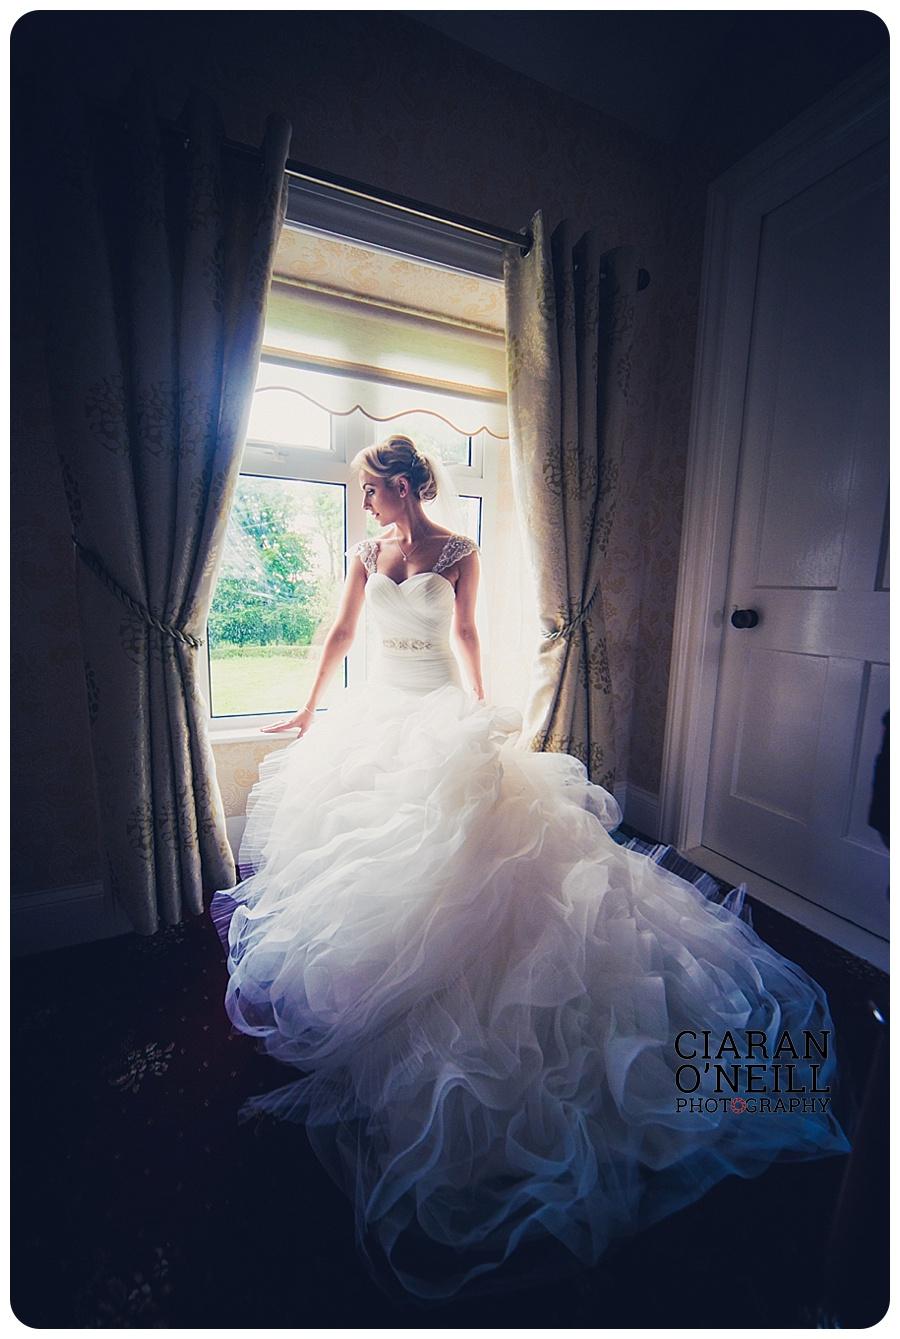 Helen & Glenn's wedding at the Manor House Hotel by Ciaran O'Neill Photography 38